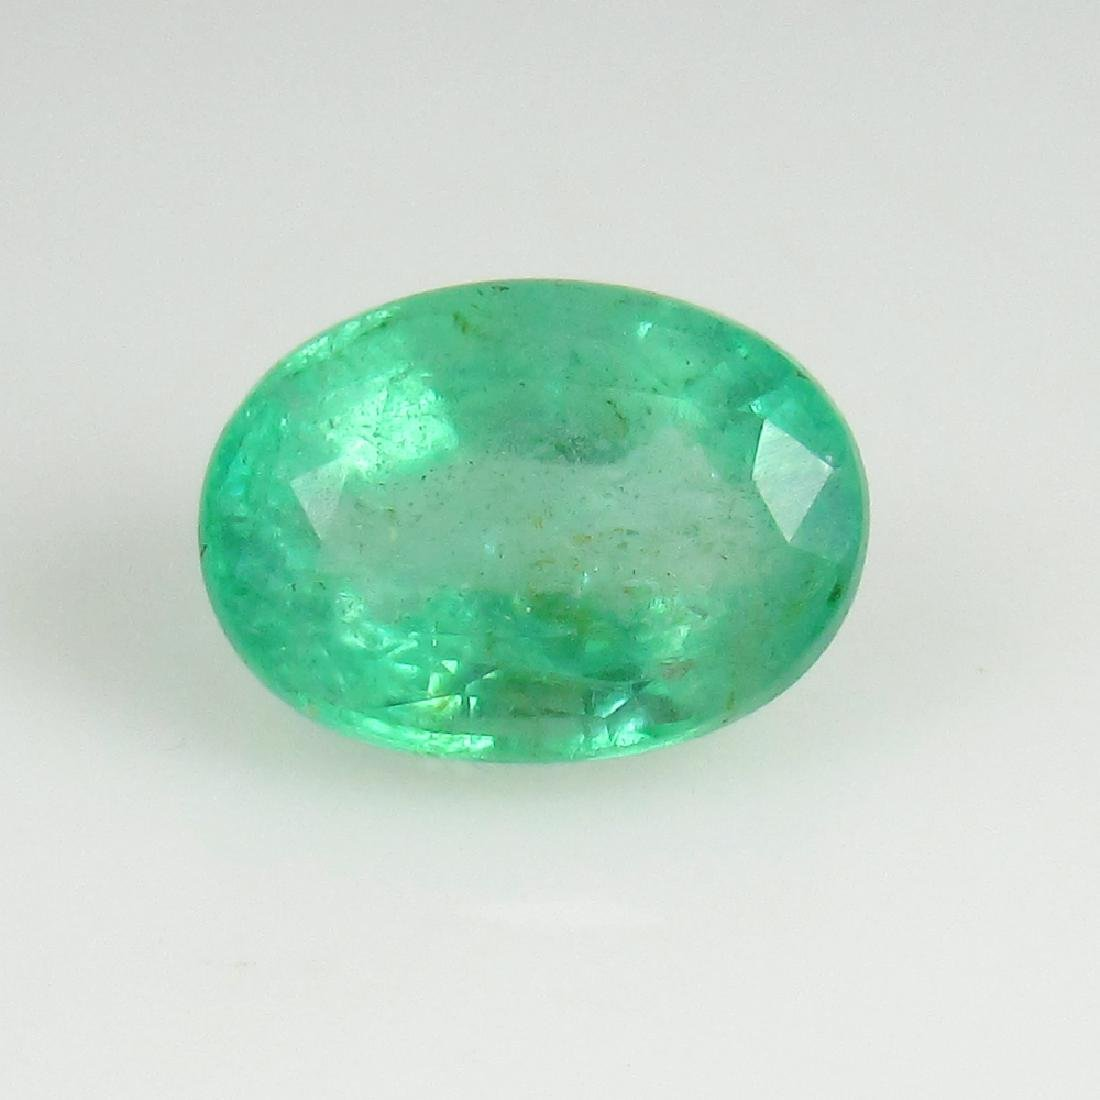 IGI Certified 2.01 Ct Genuine Colombian Emerald Good